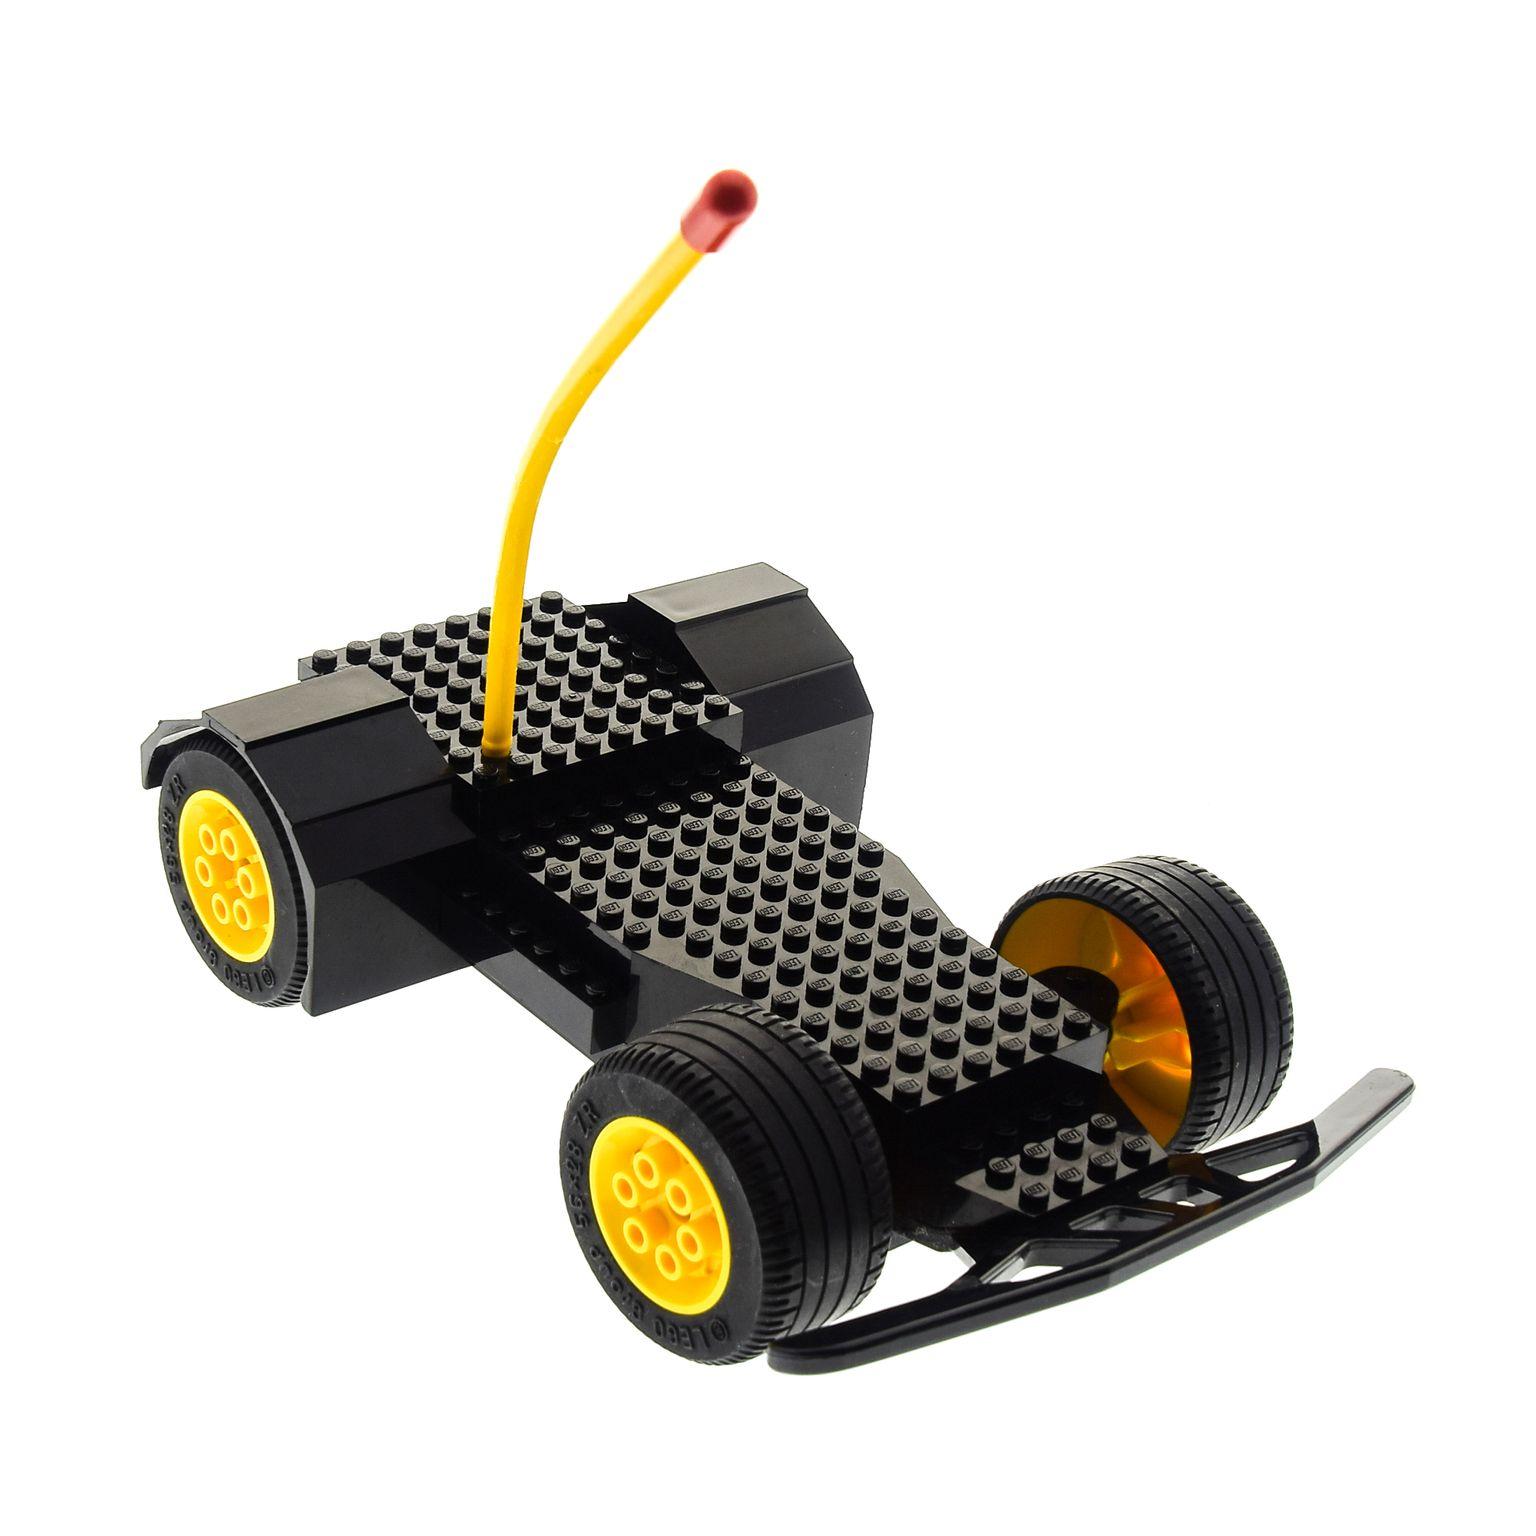 1 X Lego Brick Black Electric Rc Car Base Sets 5599 5600